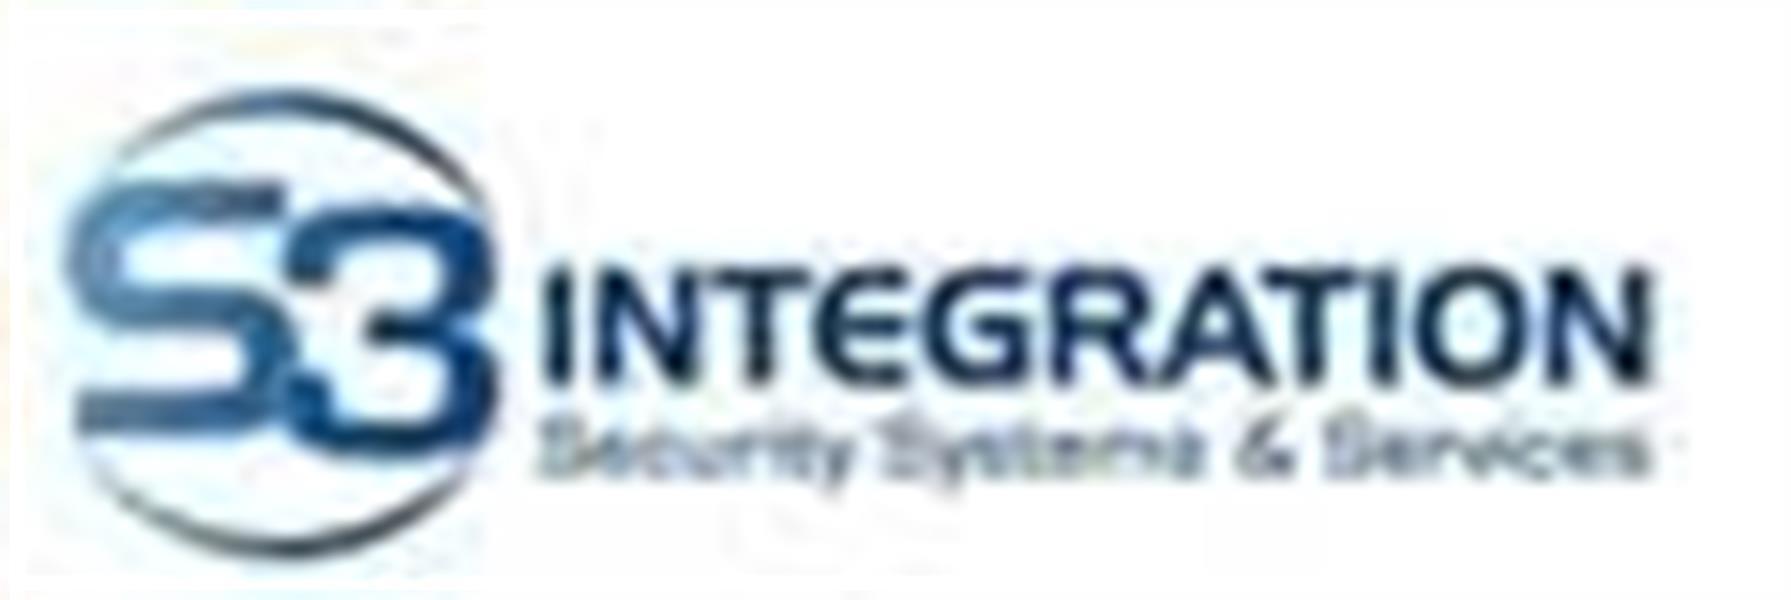 S3 Integration, LLC